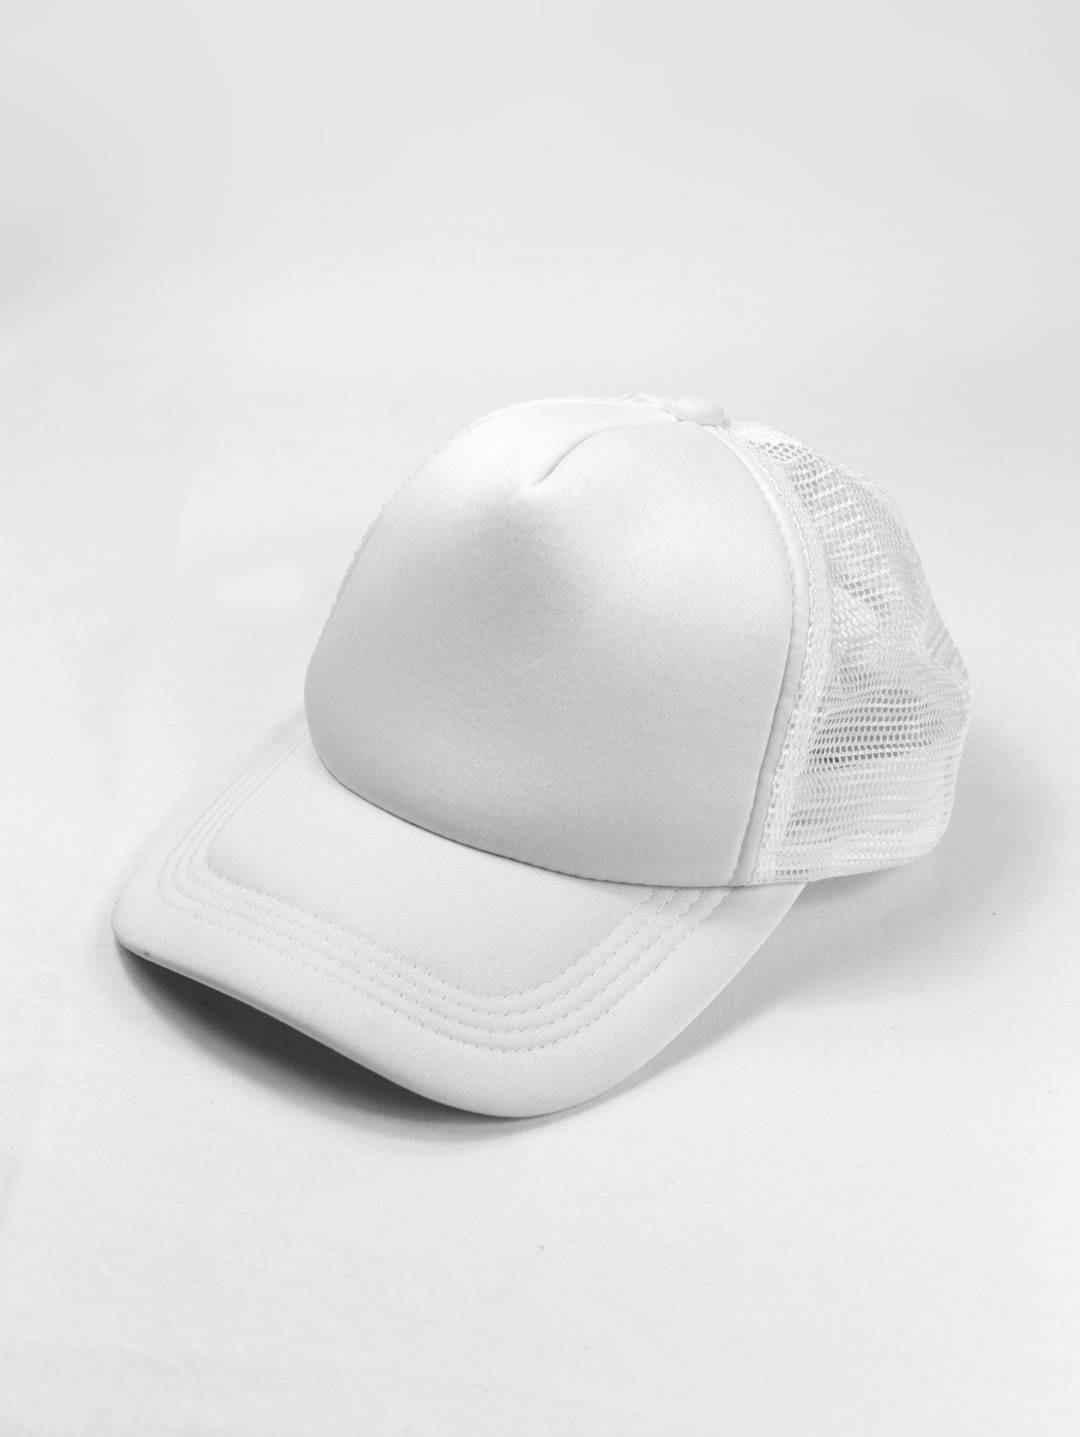 A white cap hat mockup